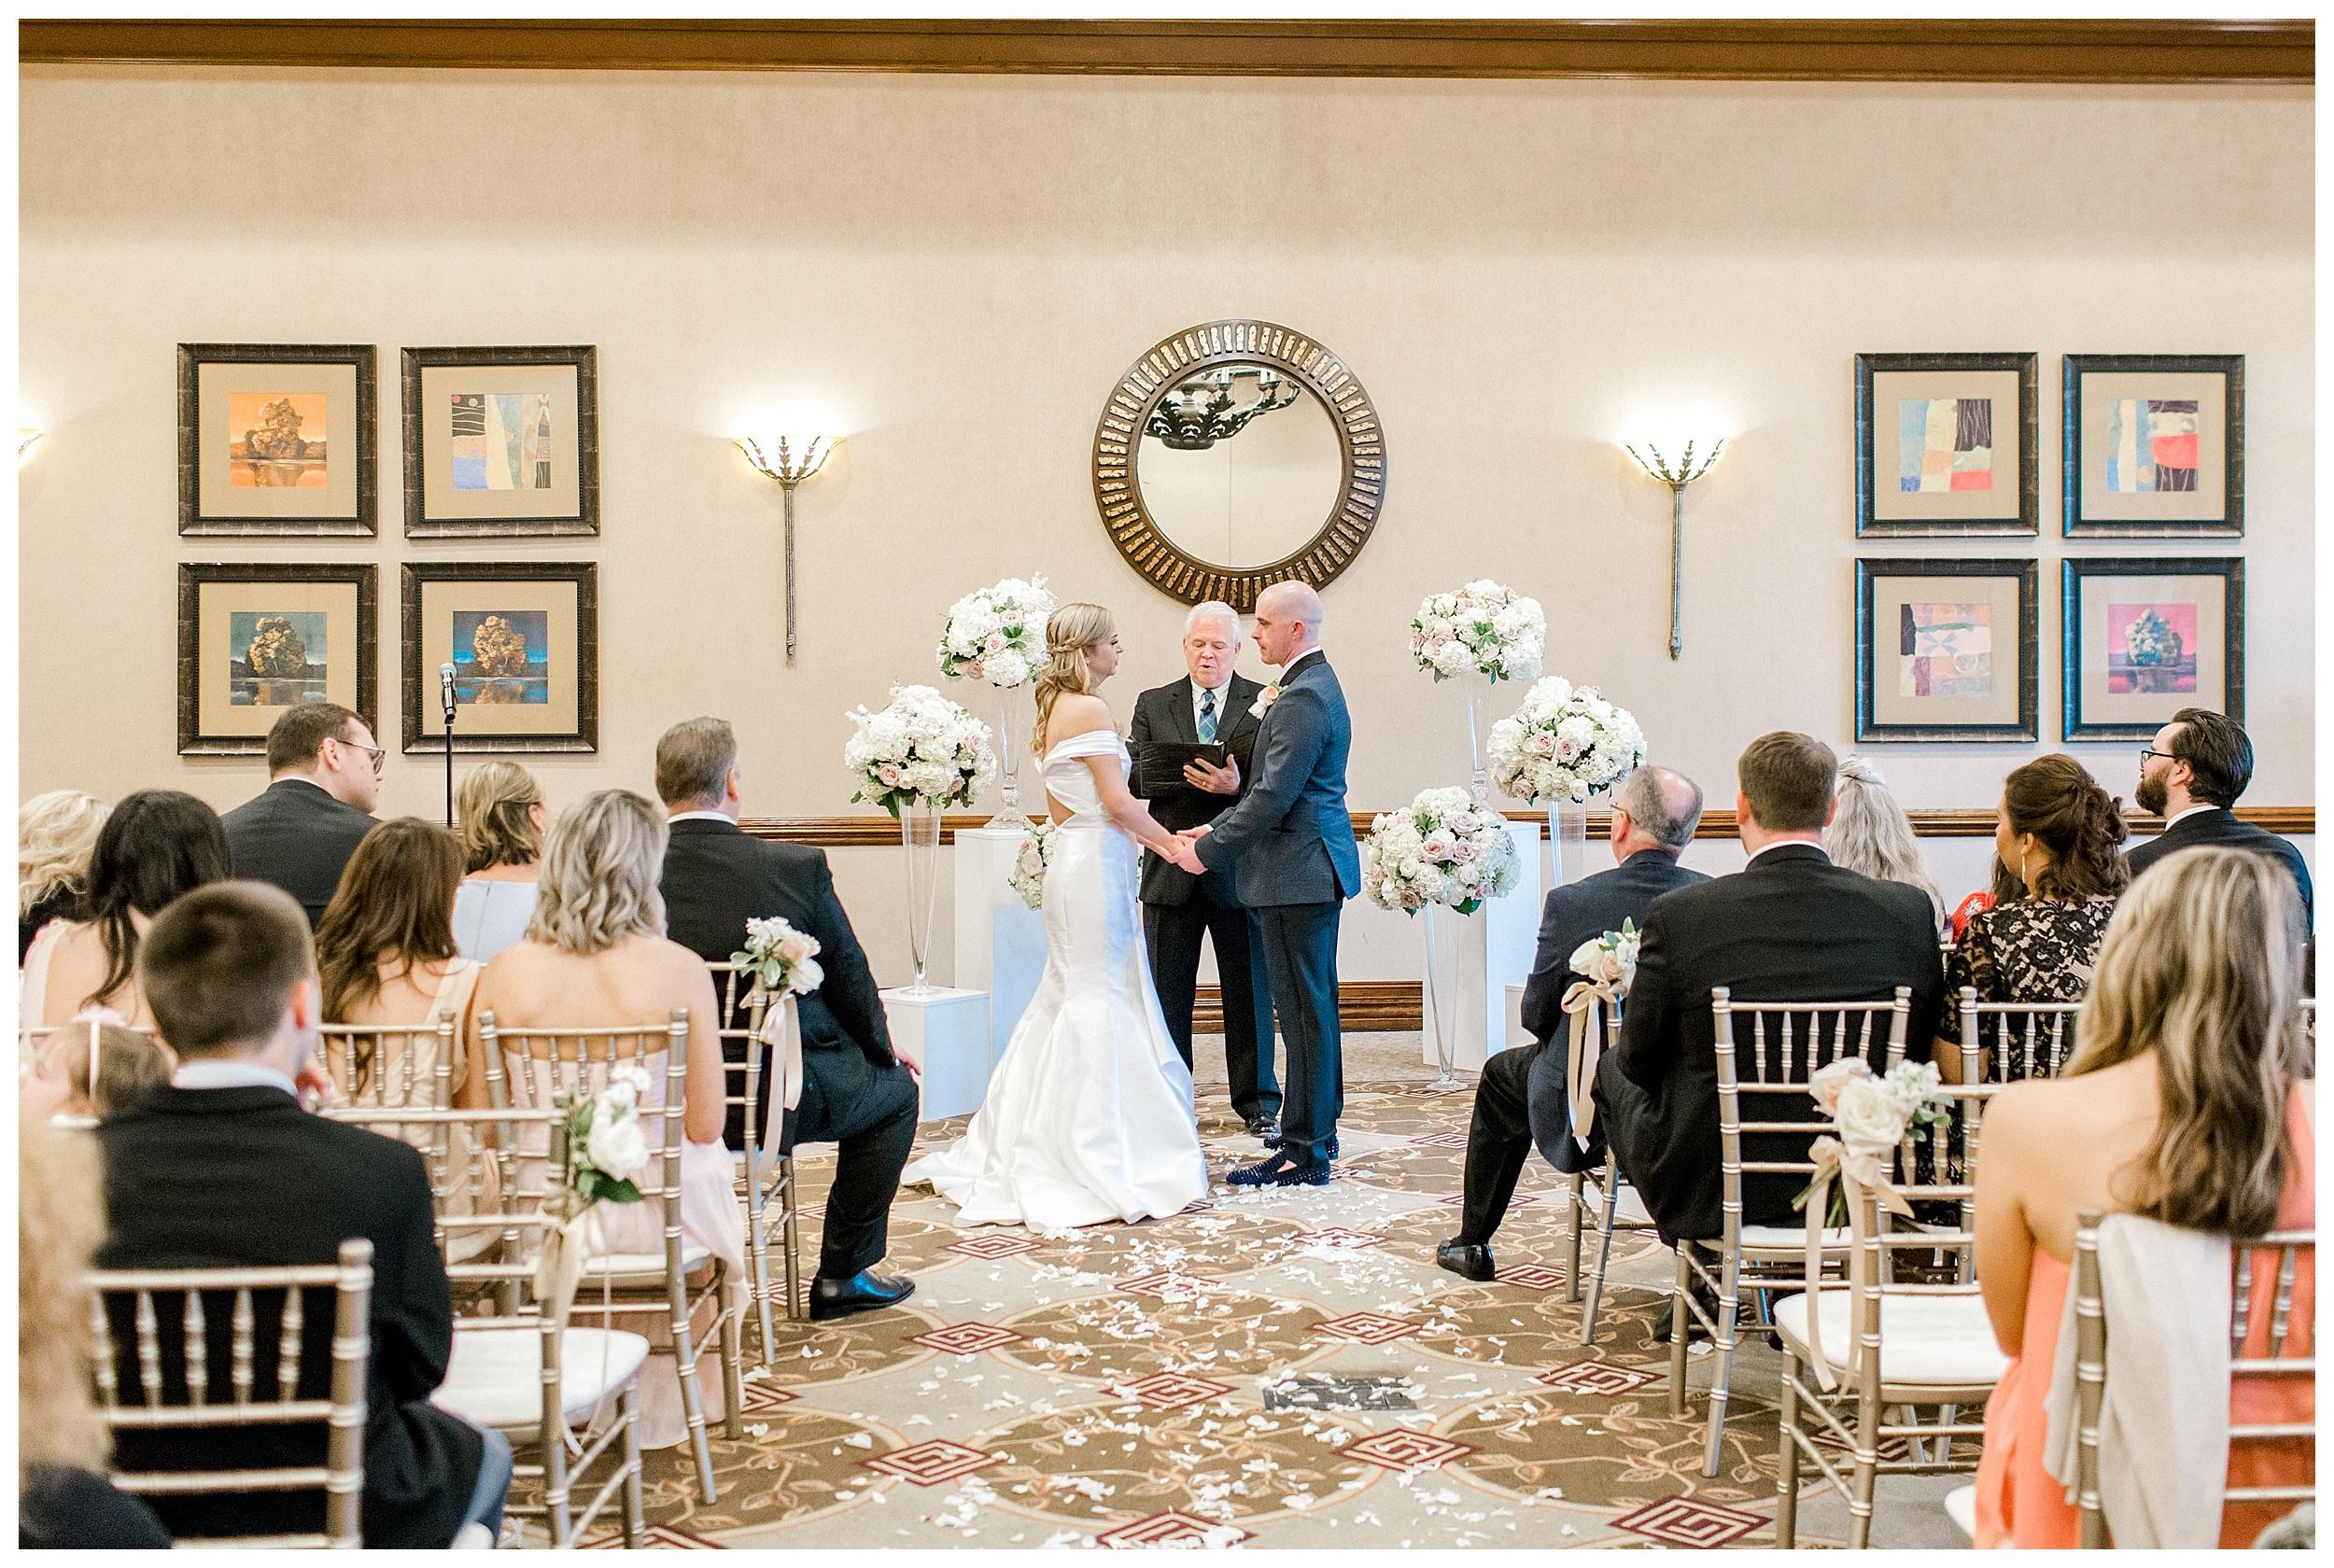 Lansdowne Resort Wedding | Virginia Film Wedding Photographer Kir Tuben_0056.jpg